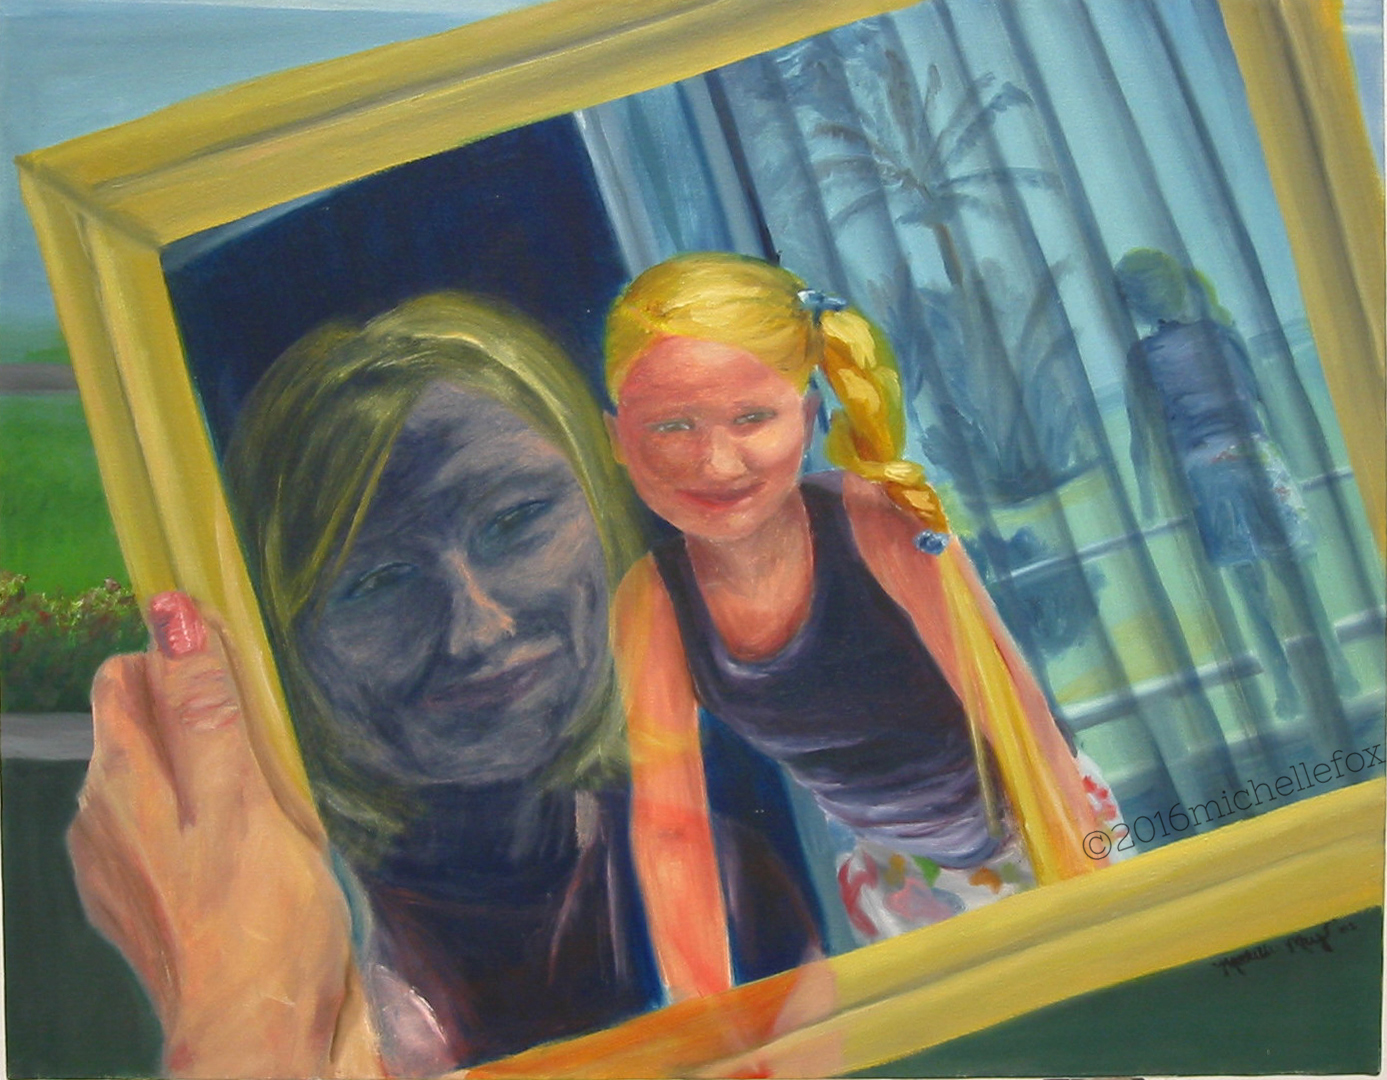 2002_05-reflecting-me-copy